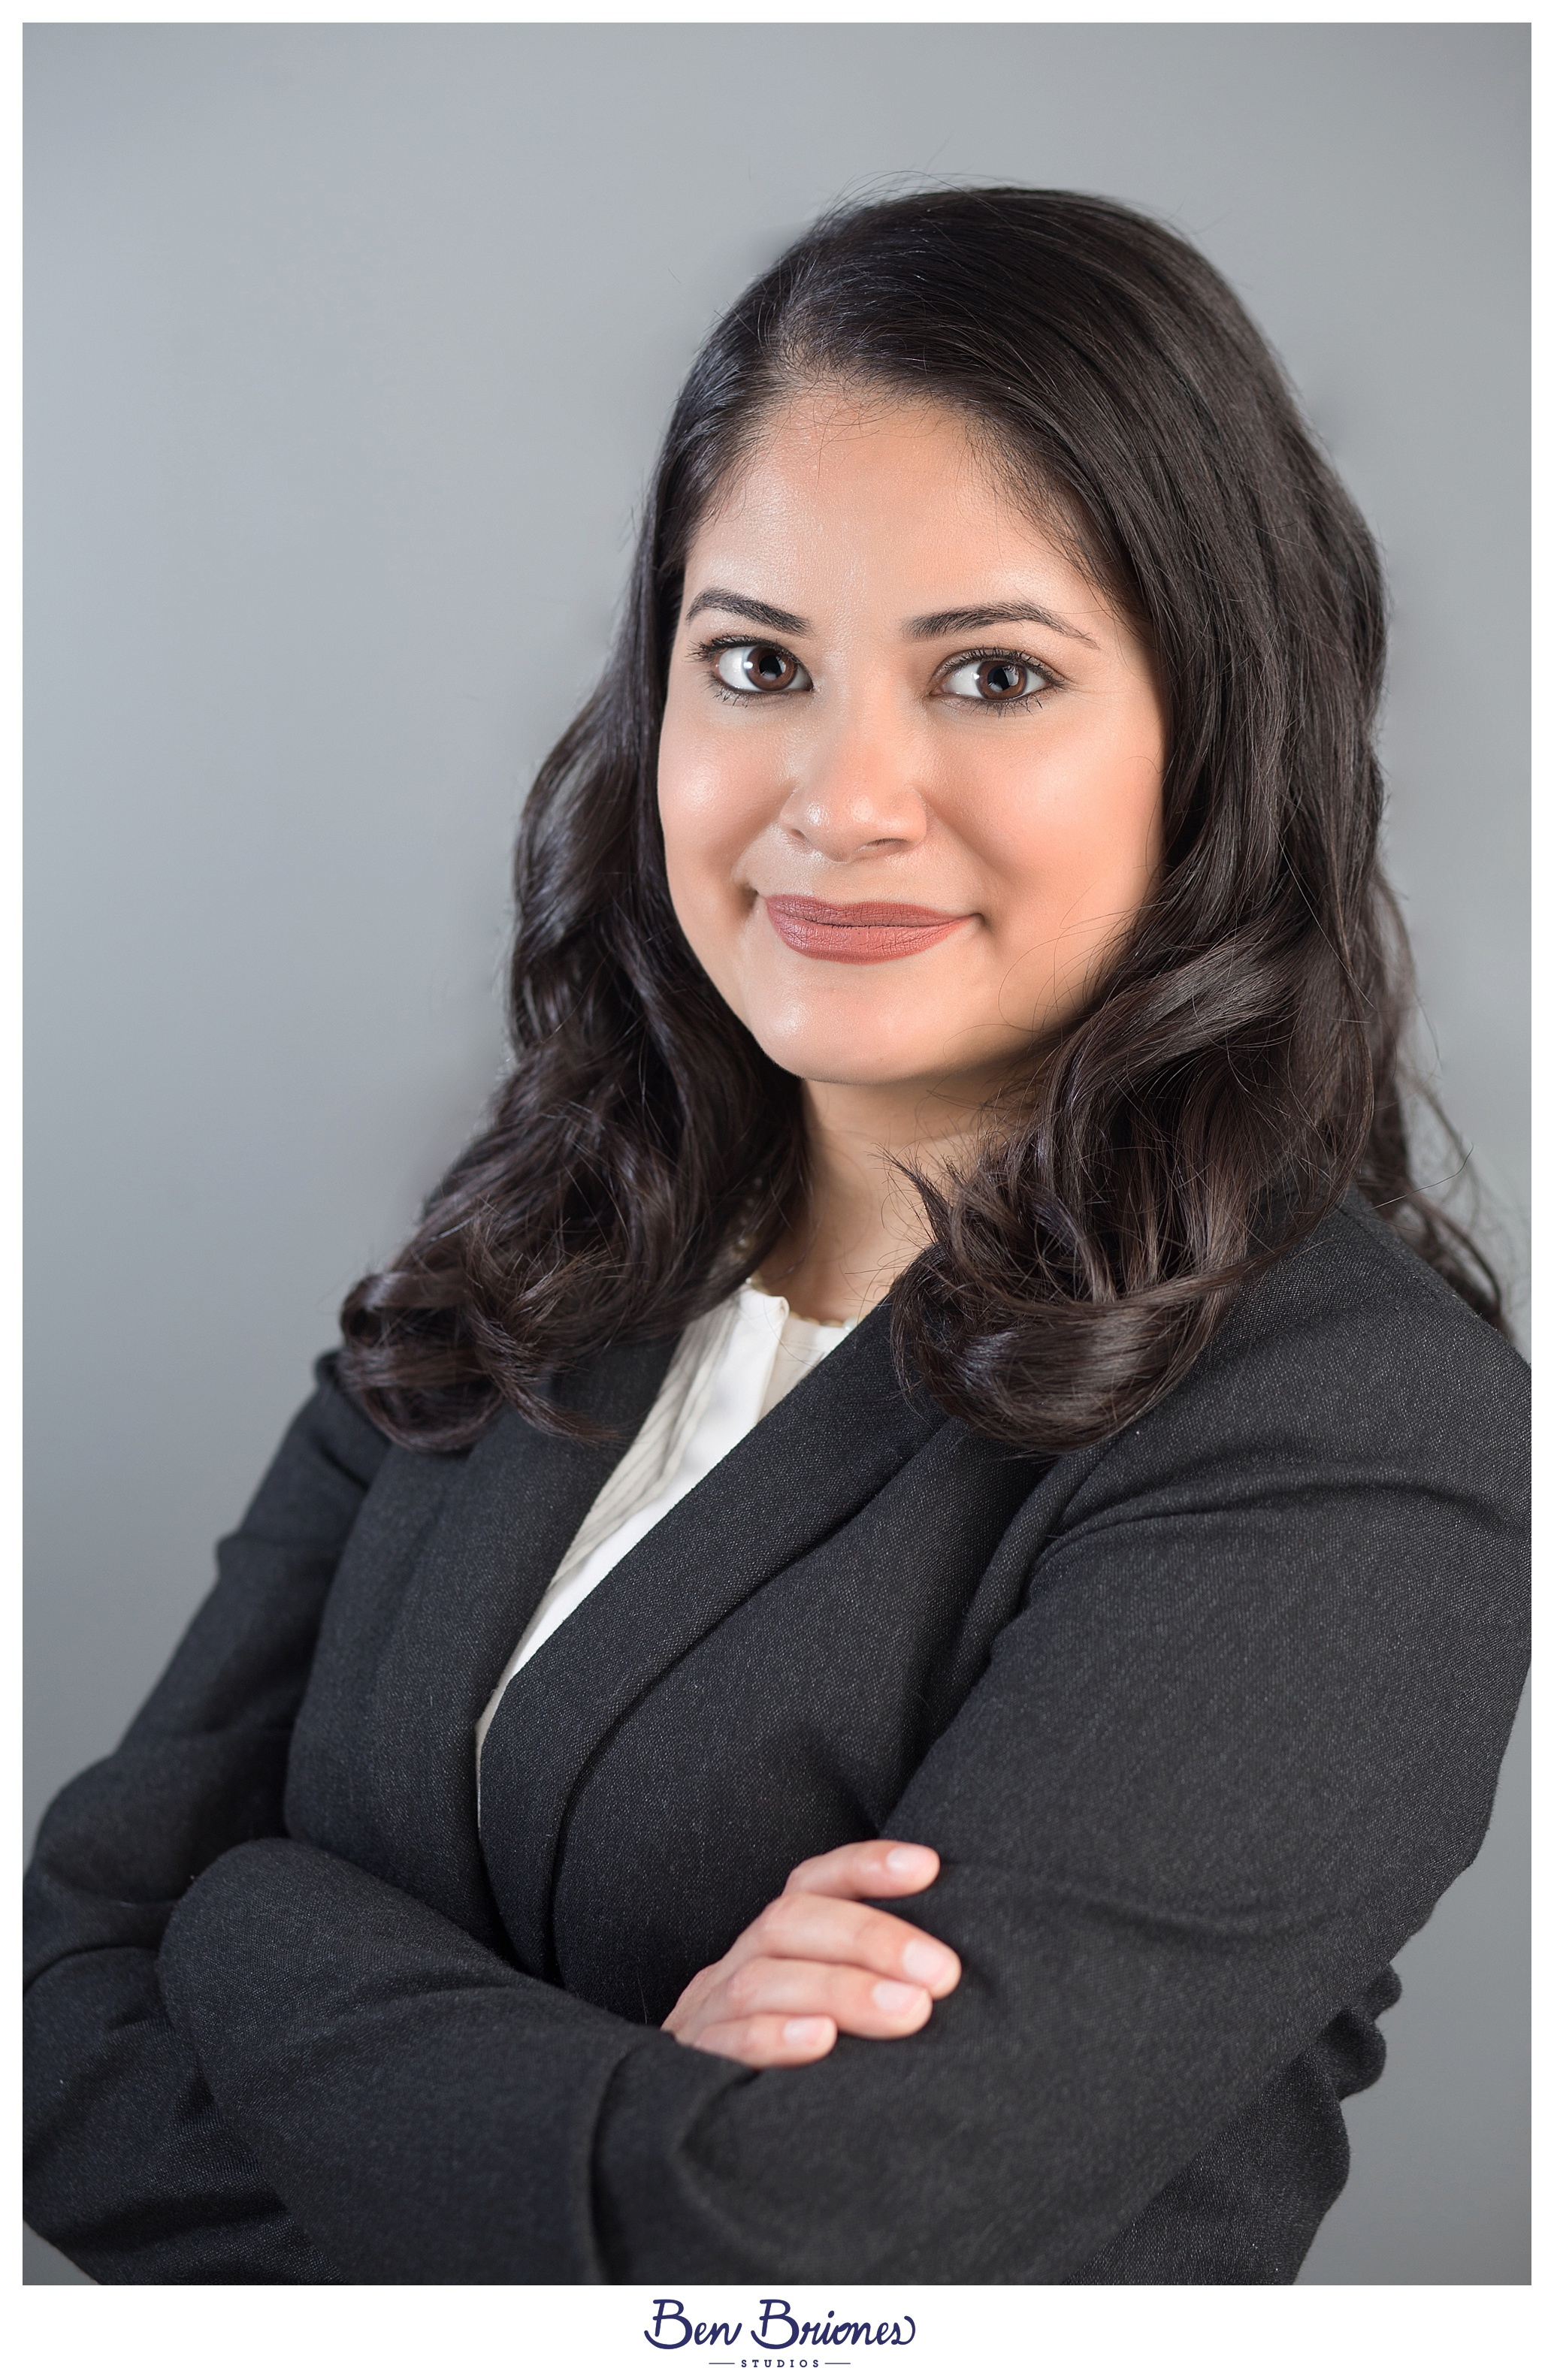 03.03.18_PRINT_Karla Olivarez Head Shots_BBS-1442_pp_WEB